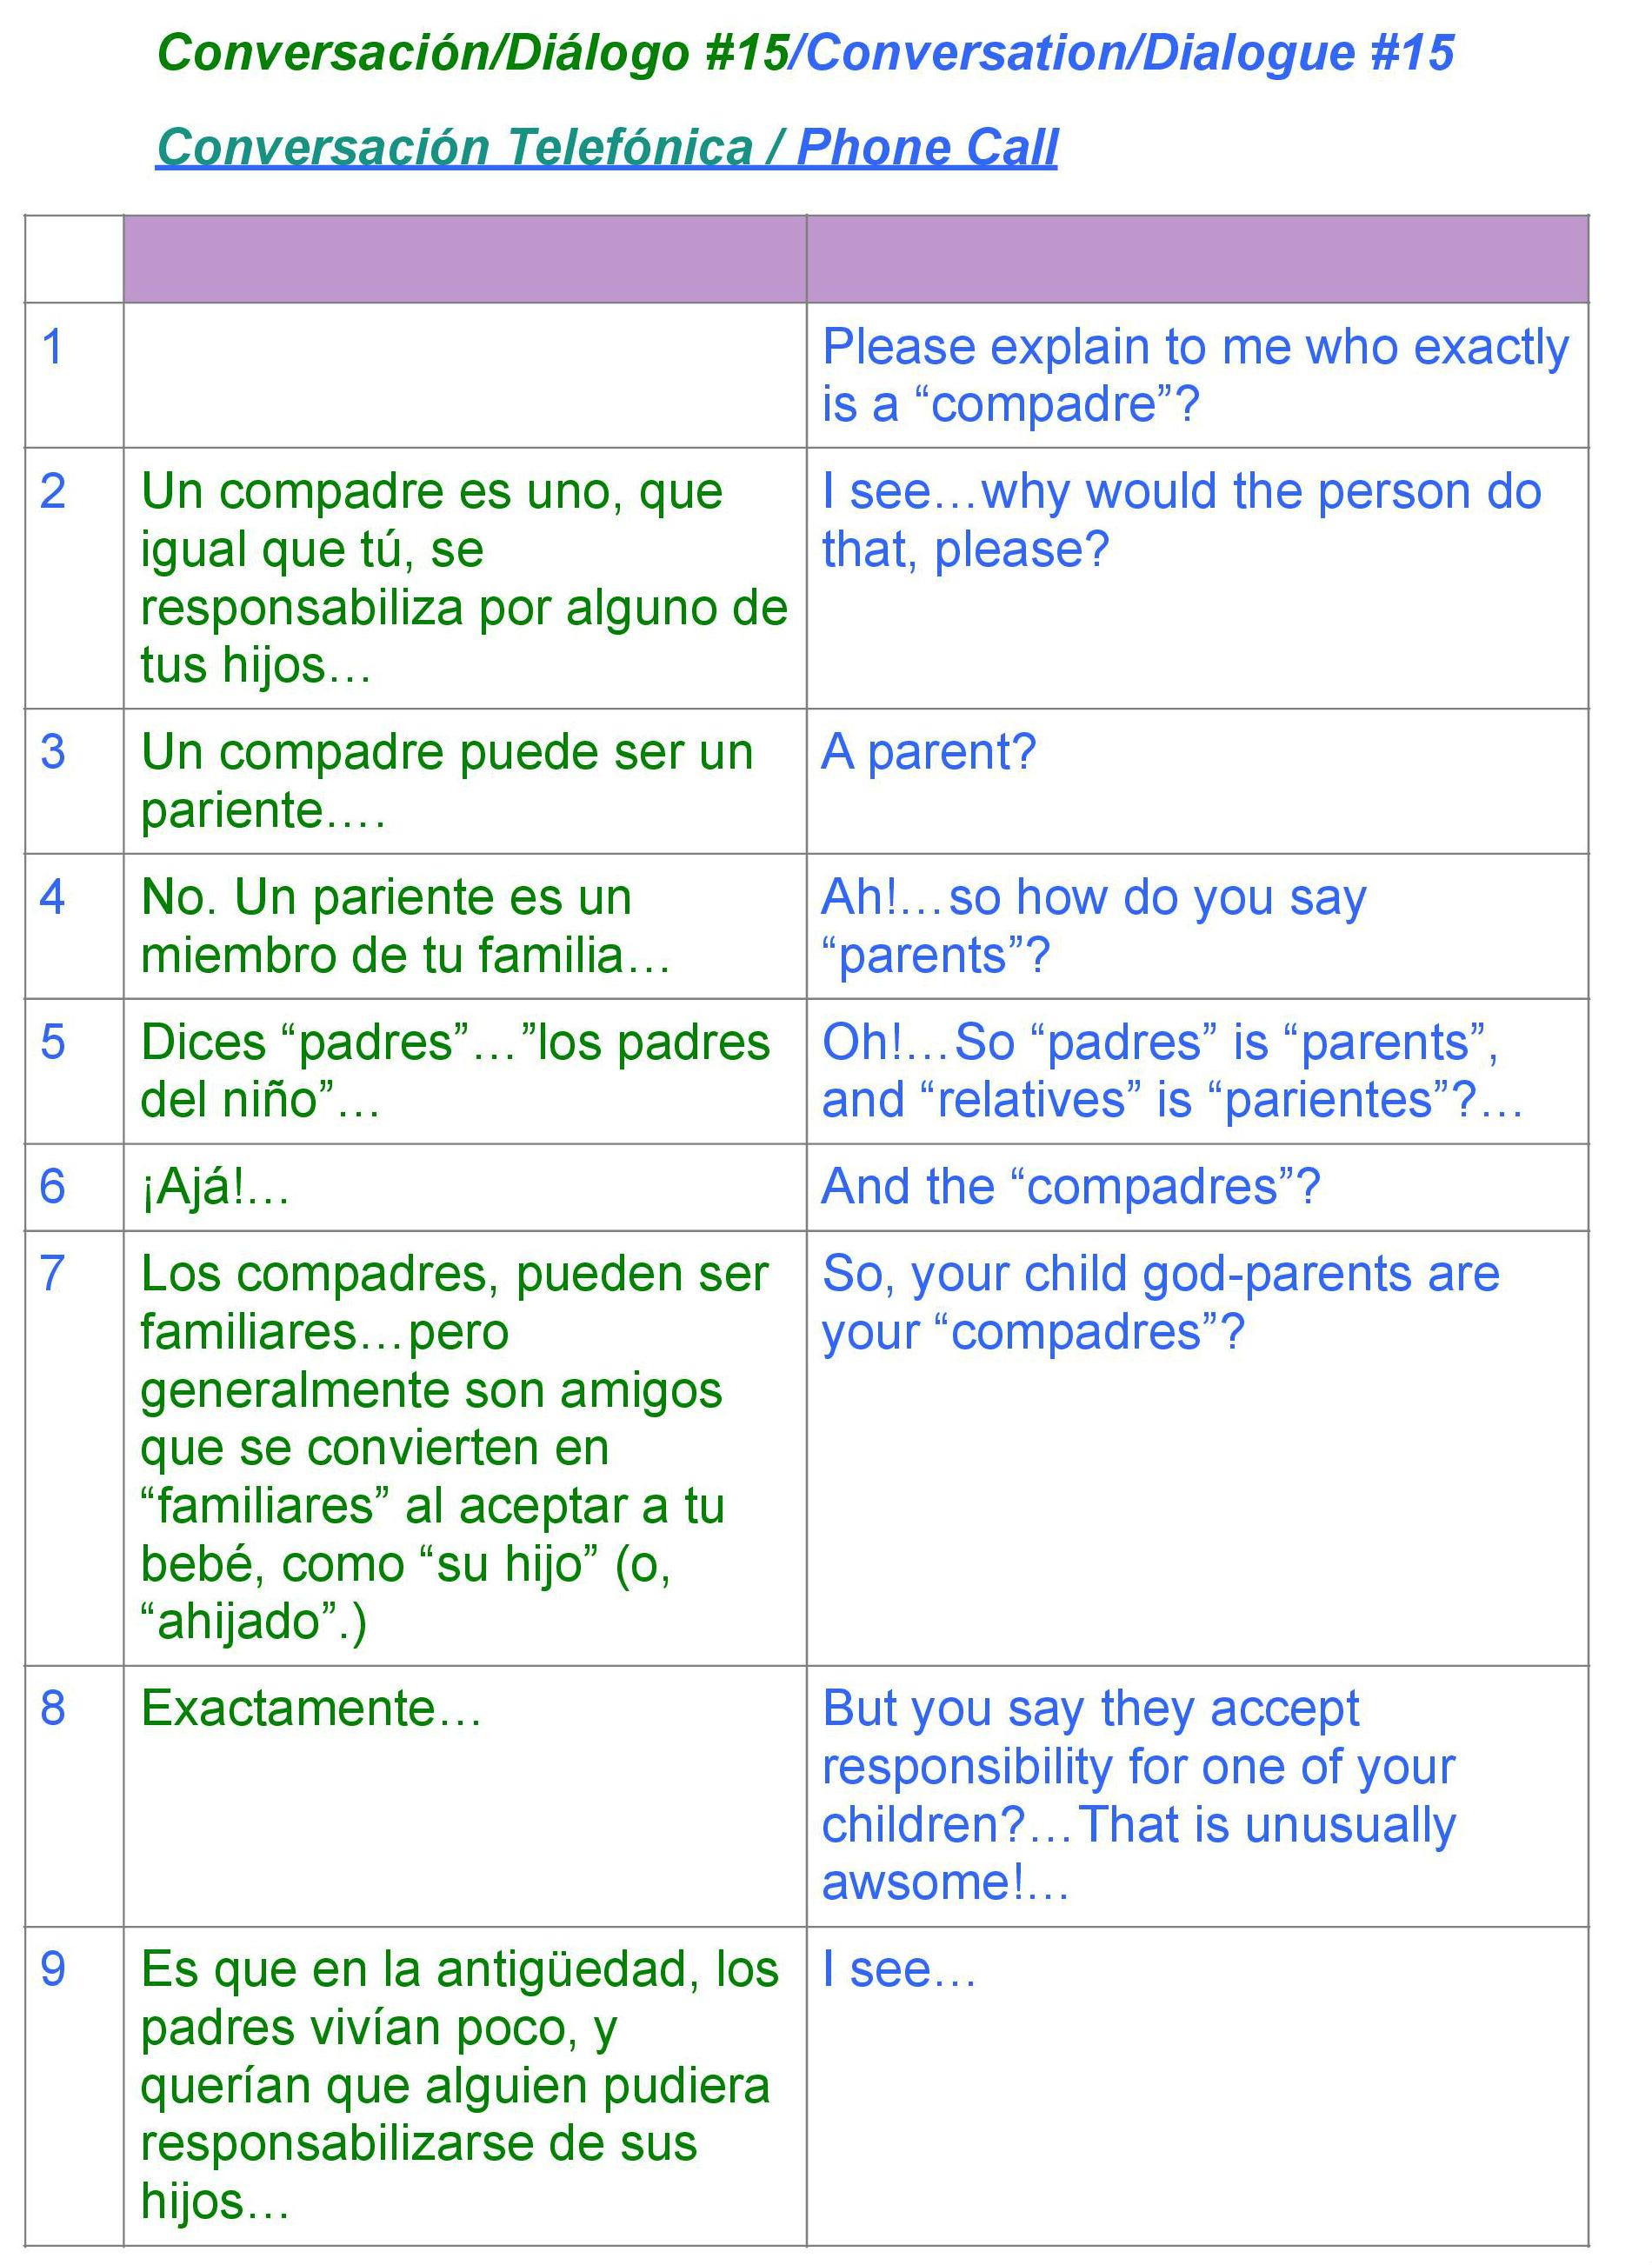 PB! Chapter Diálogo #4 IMAGE LESSON 15-1.jpg